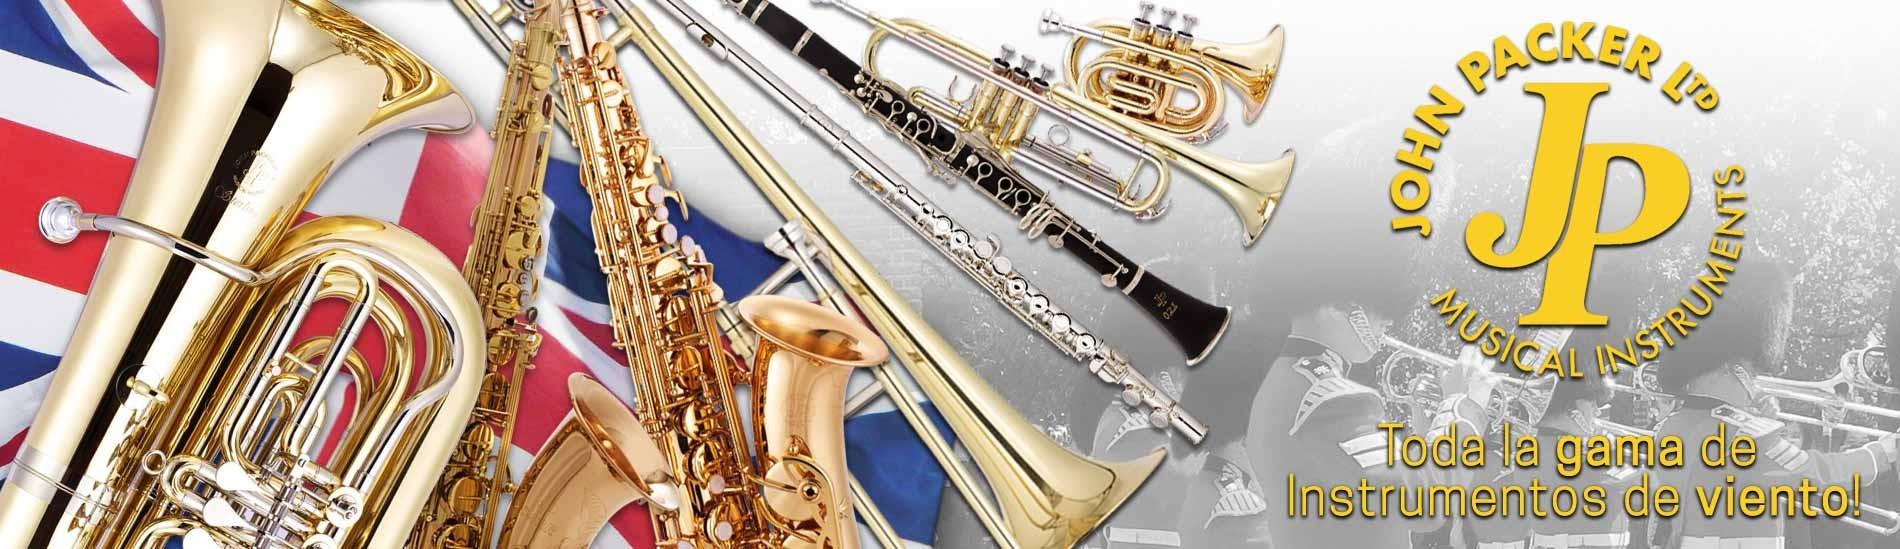 Instrumentos de viento John Packer